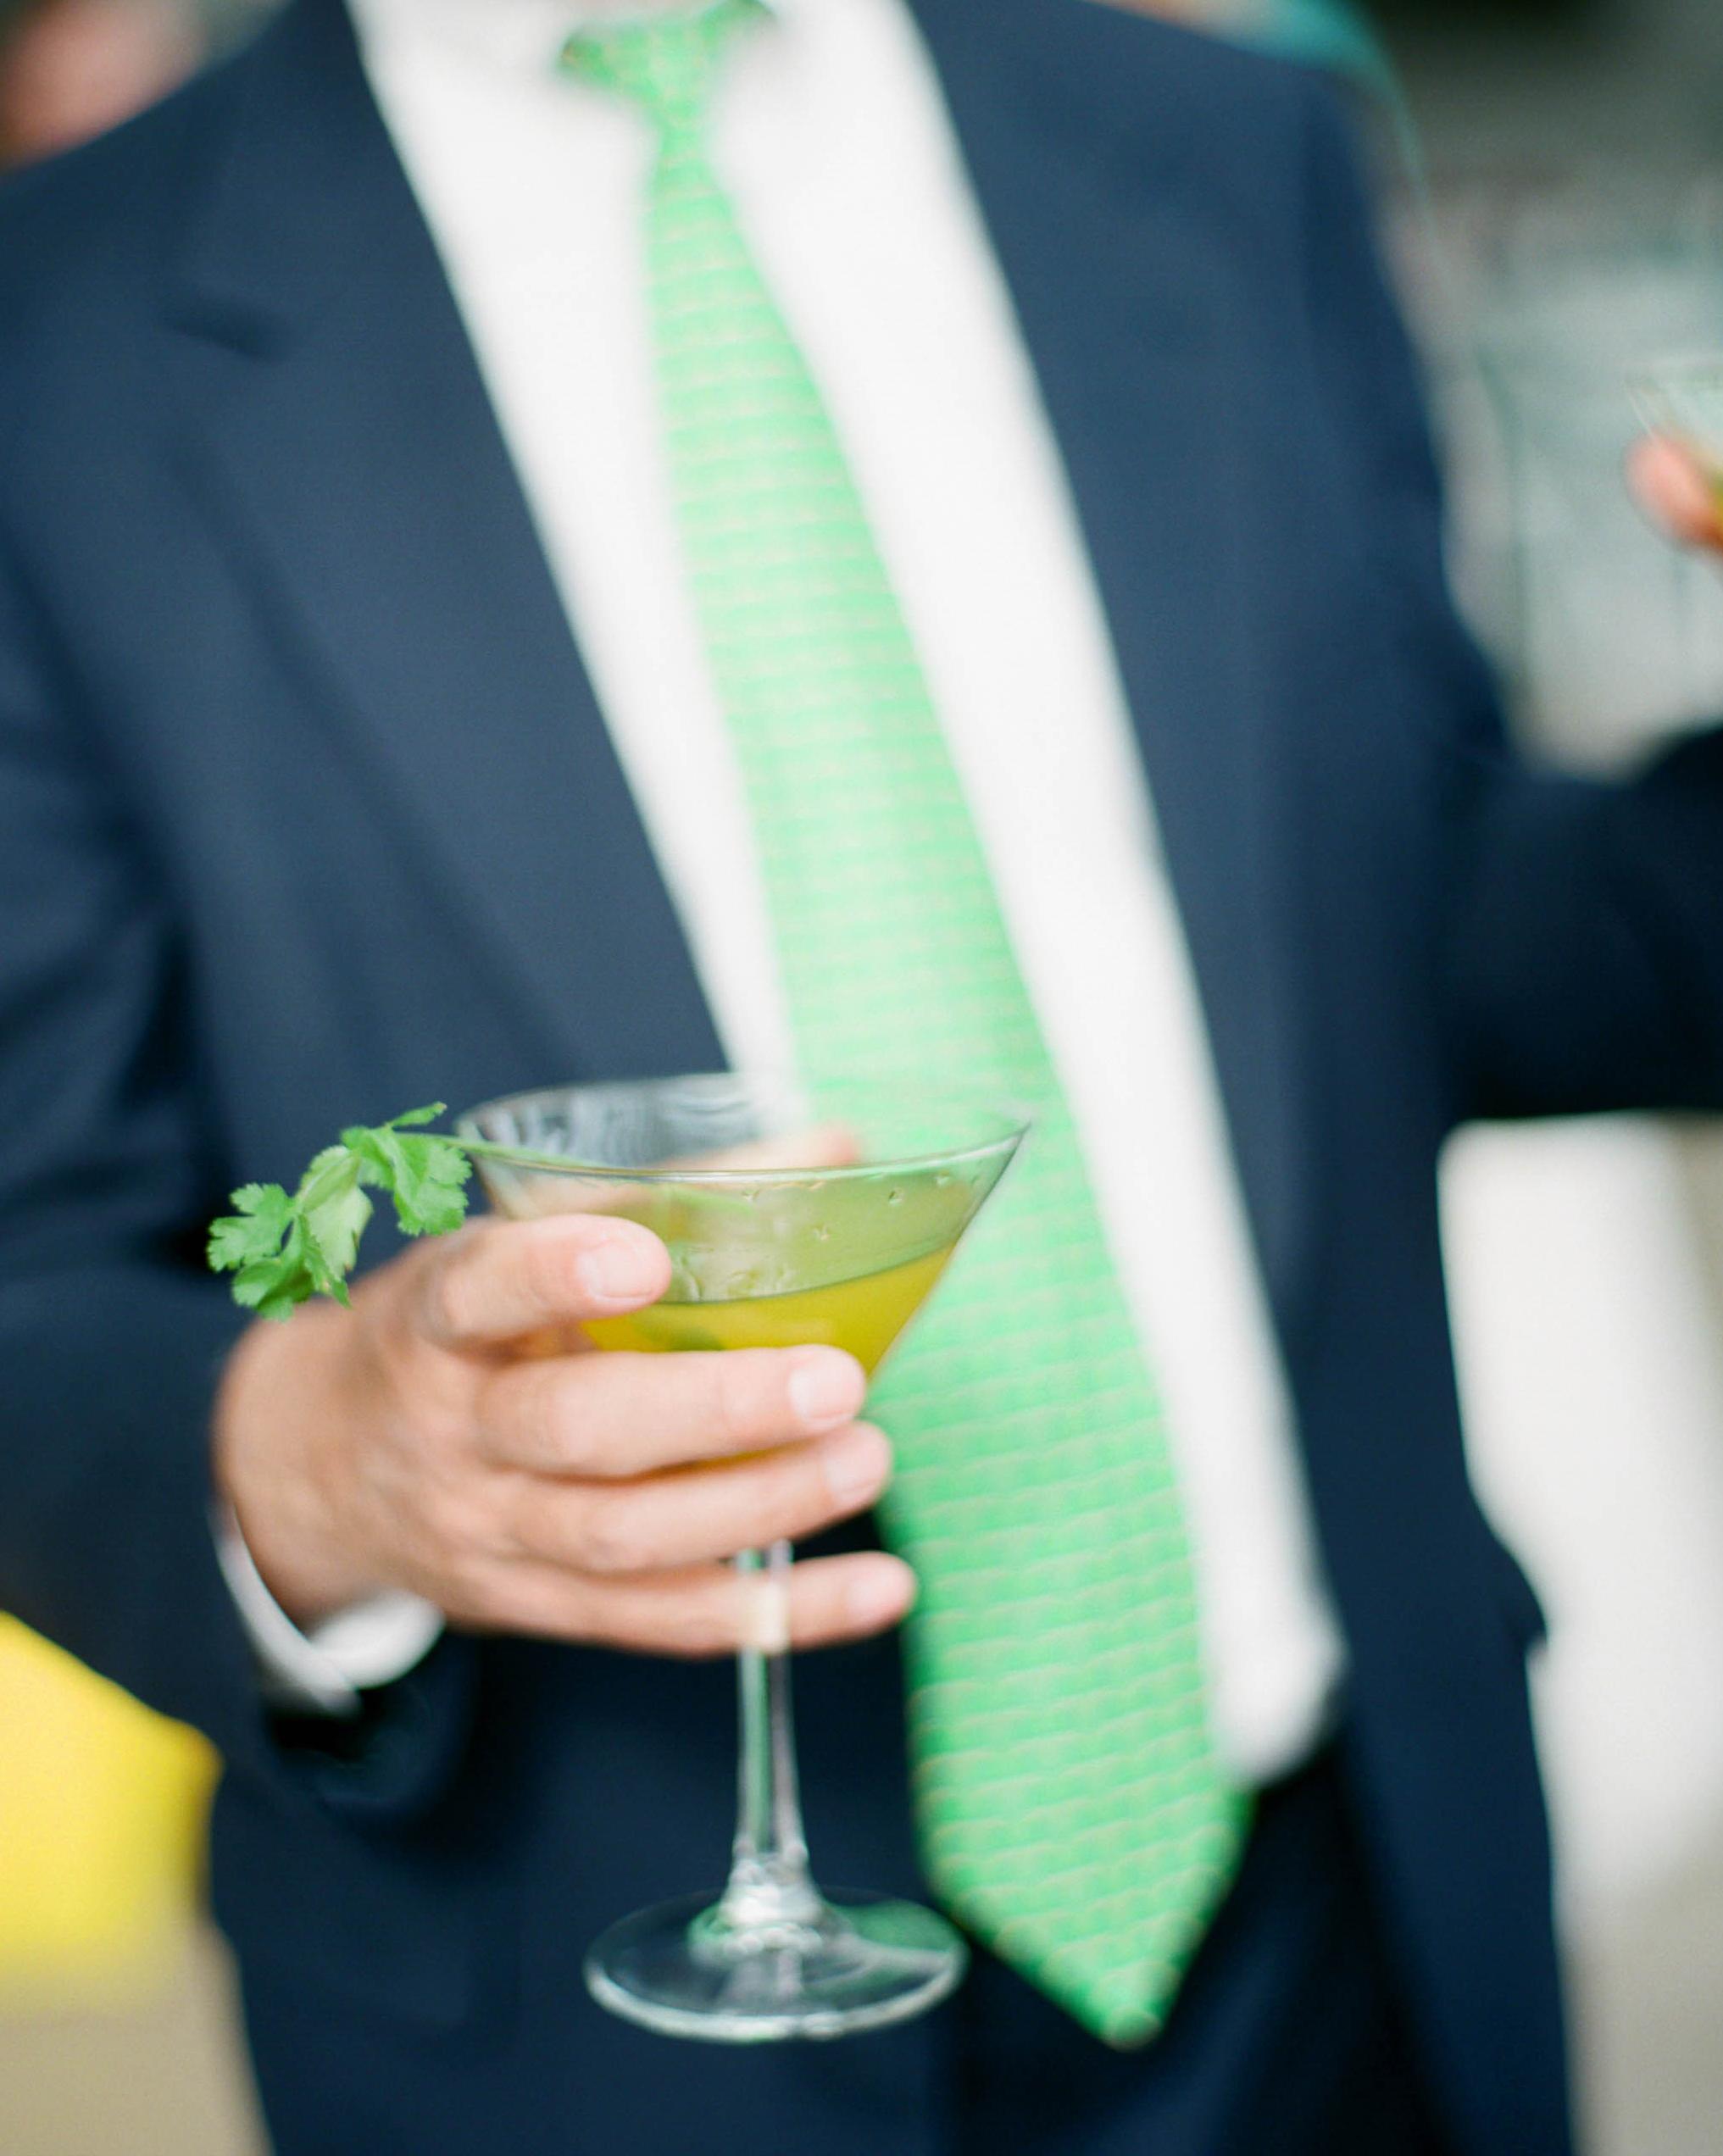 liz-jeff-wedding-cocktail-081-s112303-1115.jpg